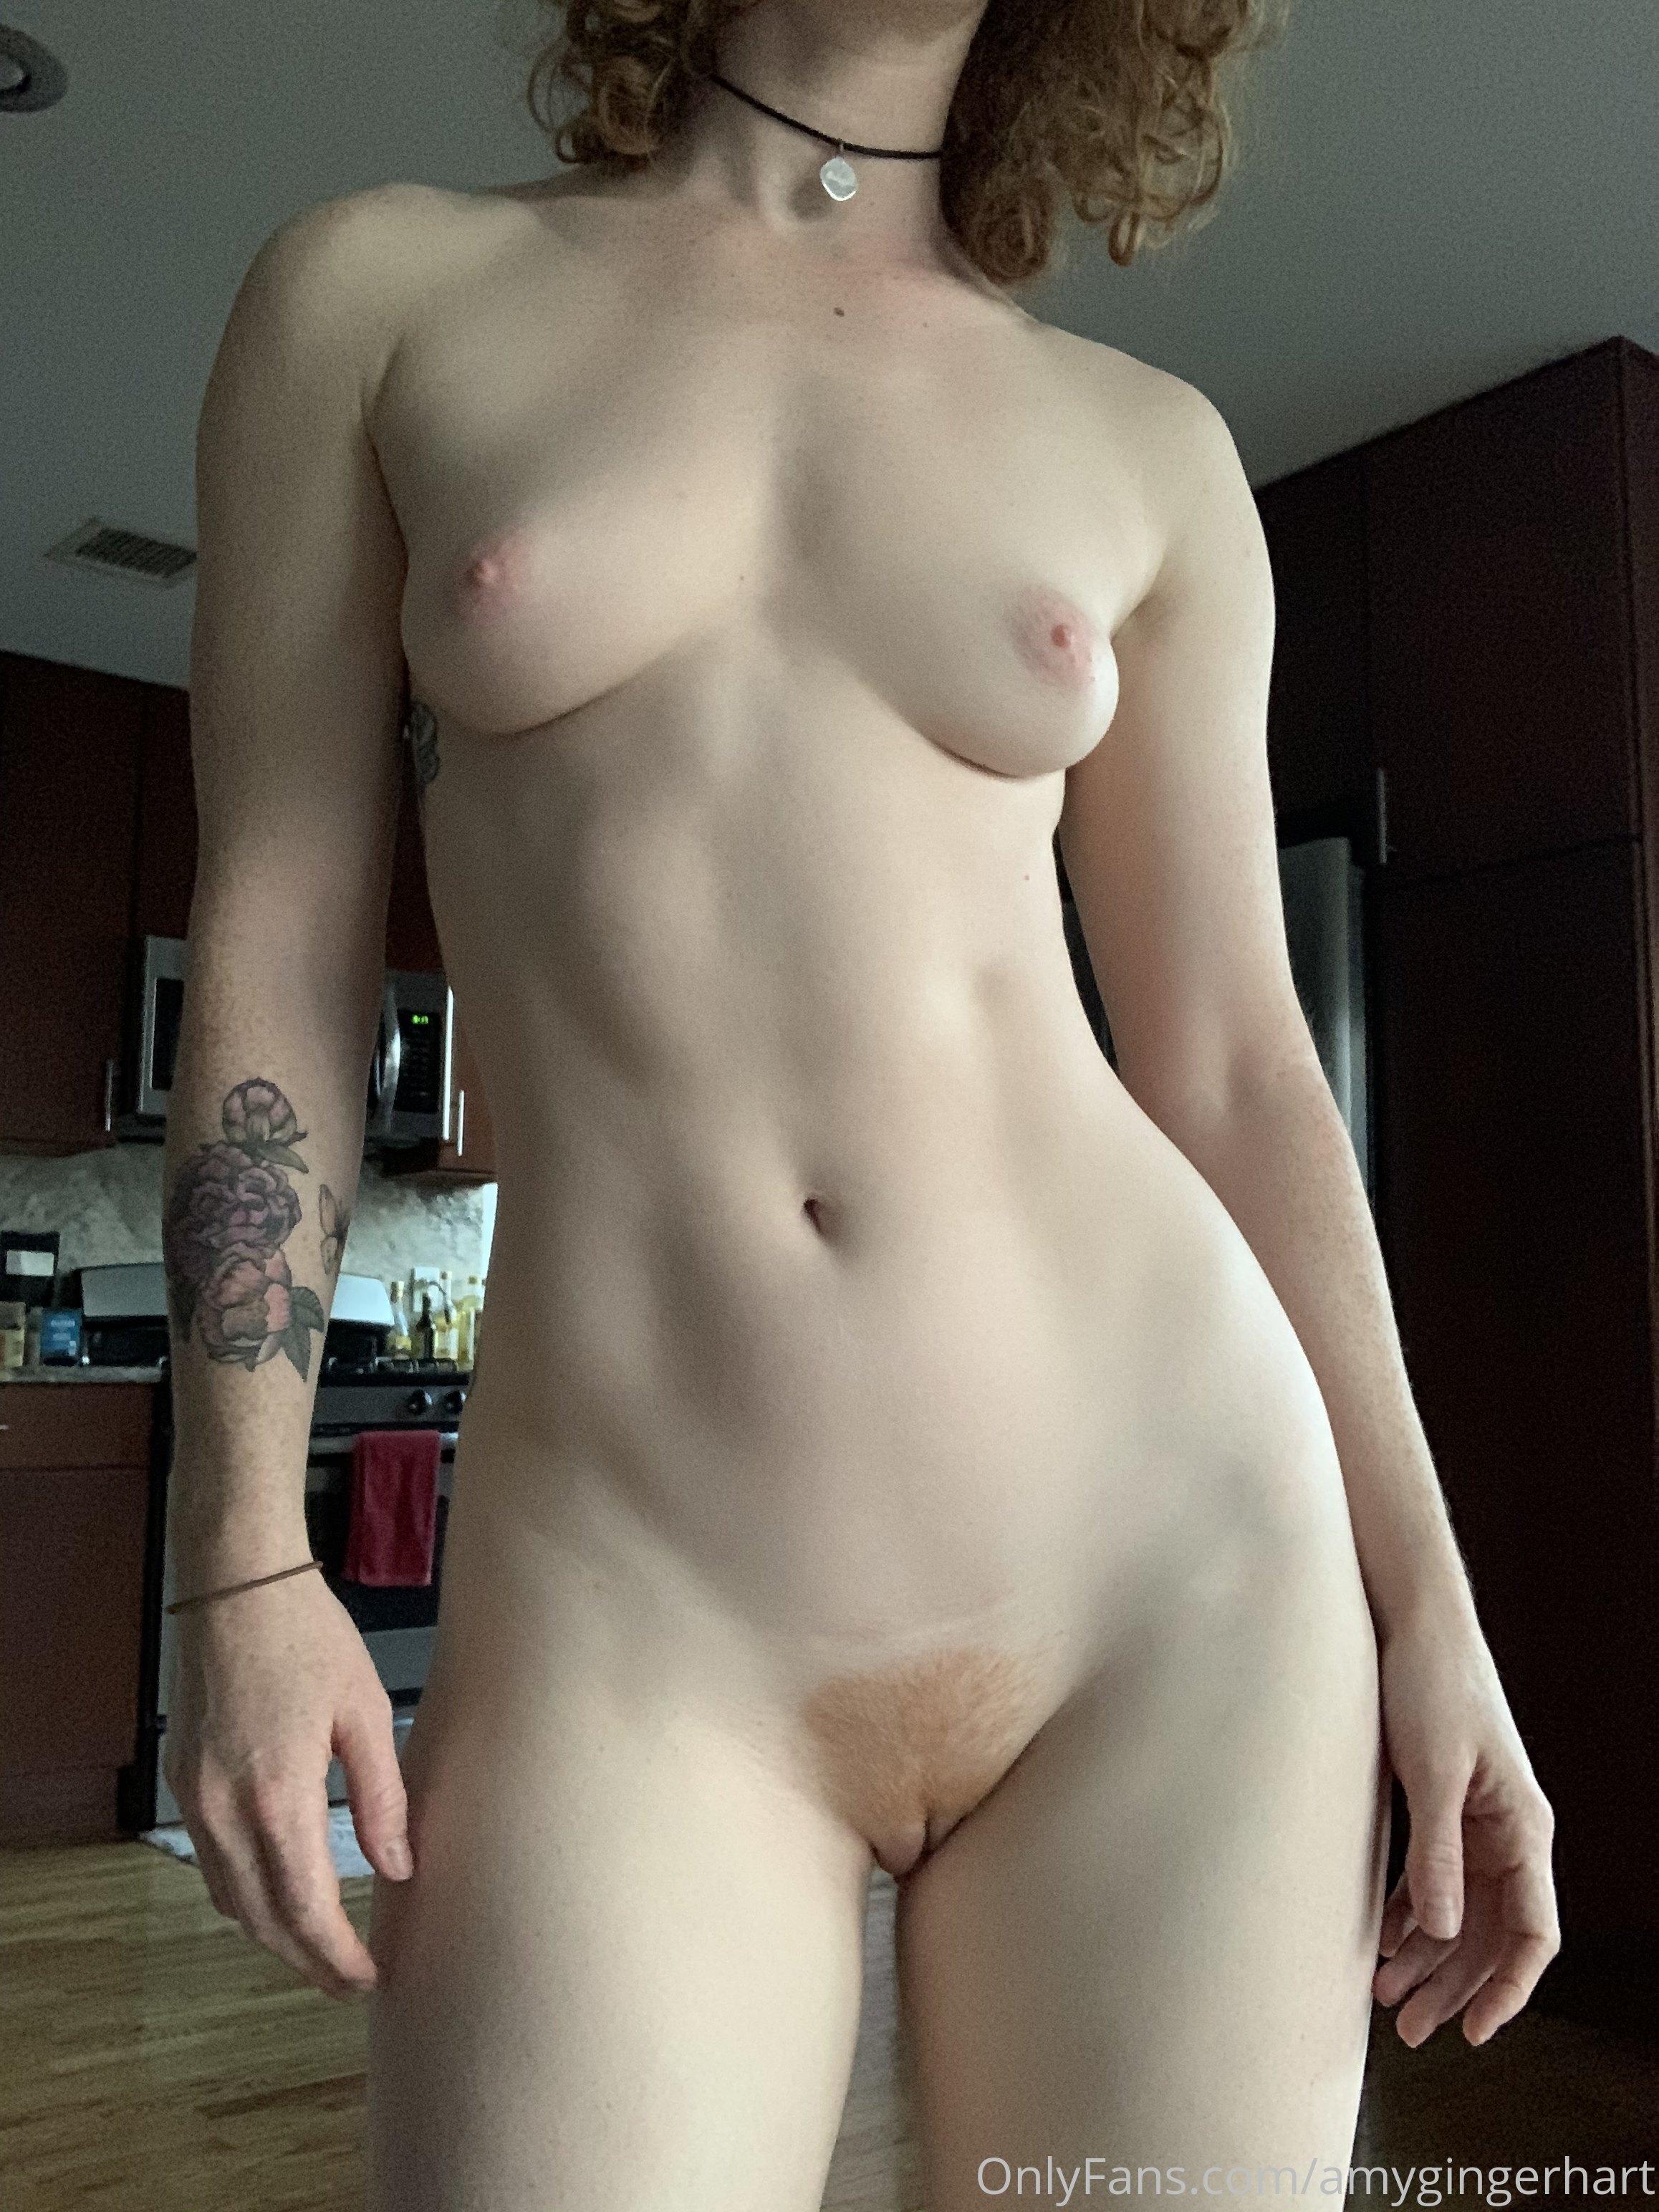 Amy Hart, Amygingerhart, Onlyfans 0146